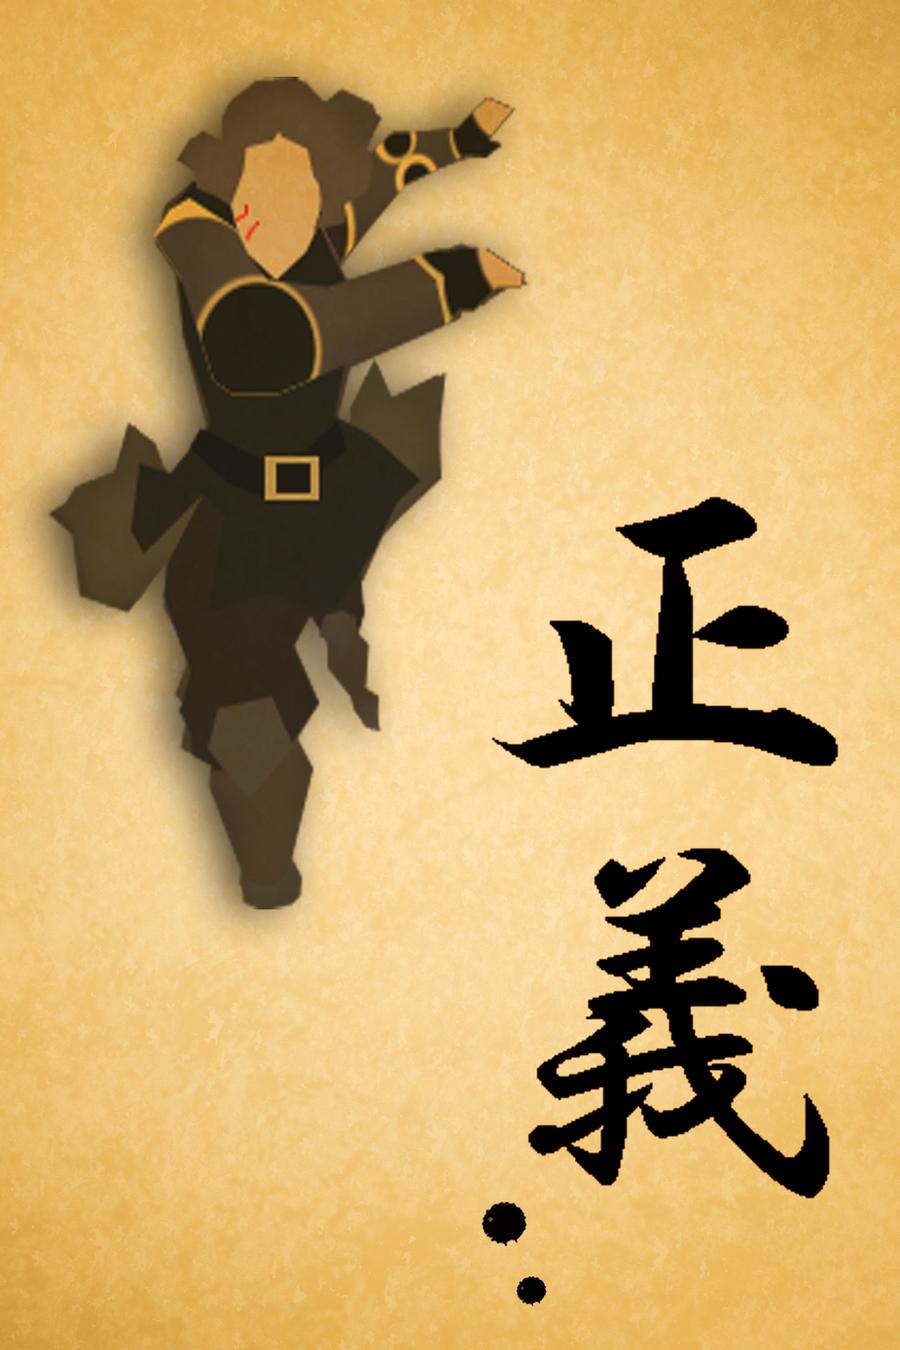 Lin Beifong - Justice by DaveBaldwin3D